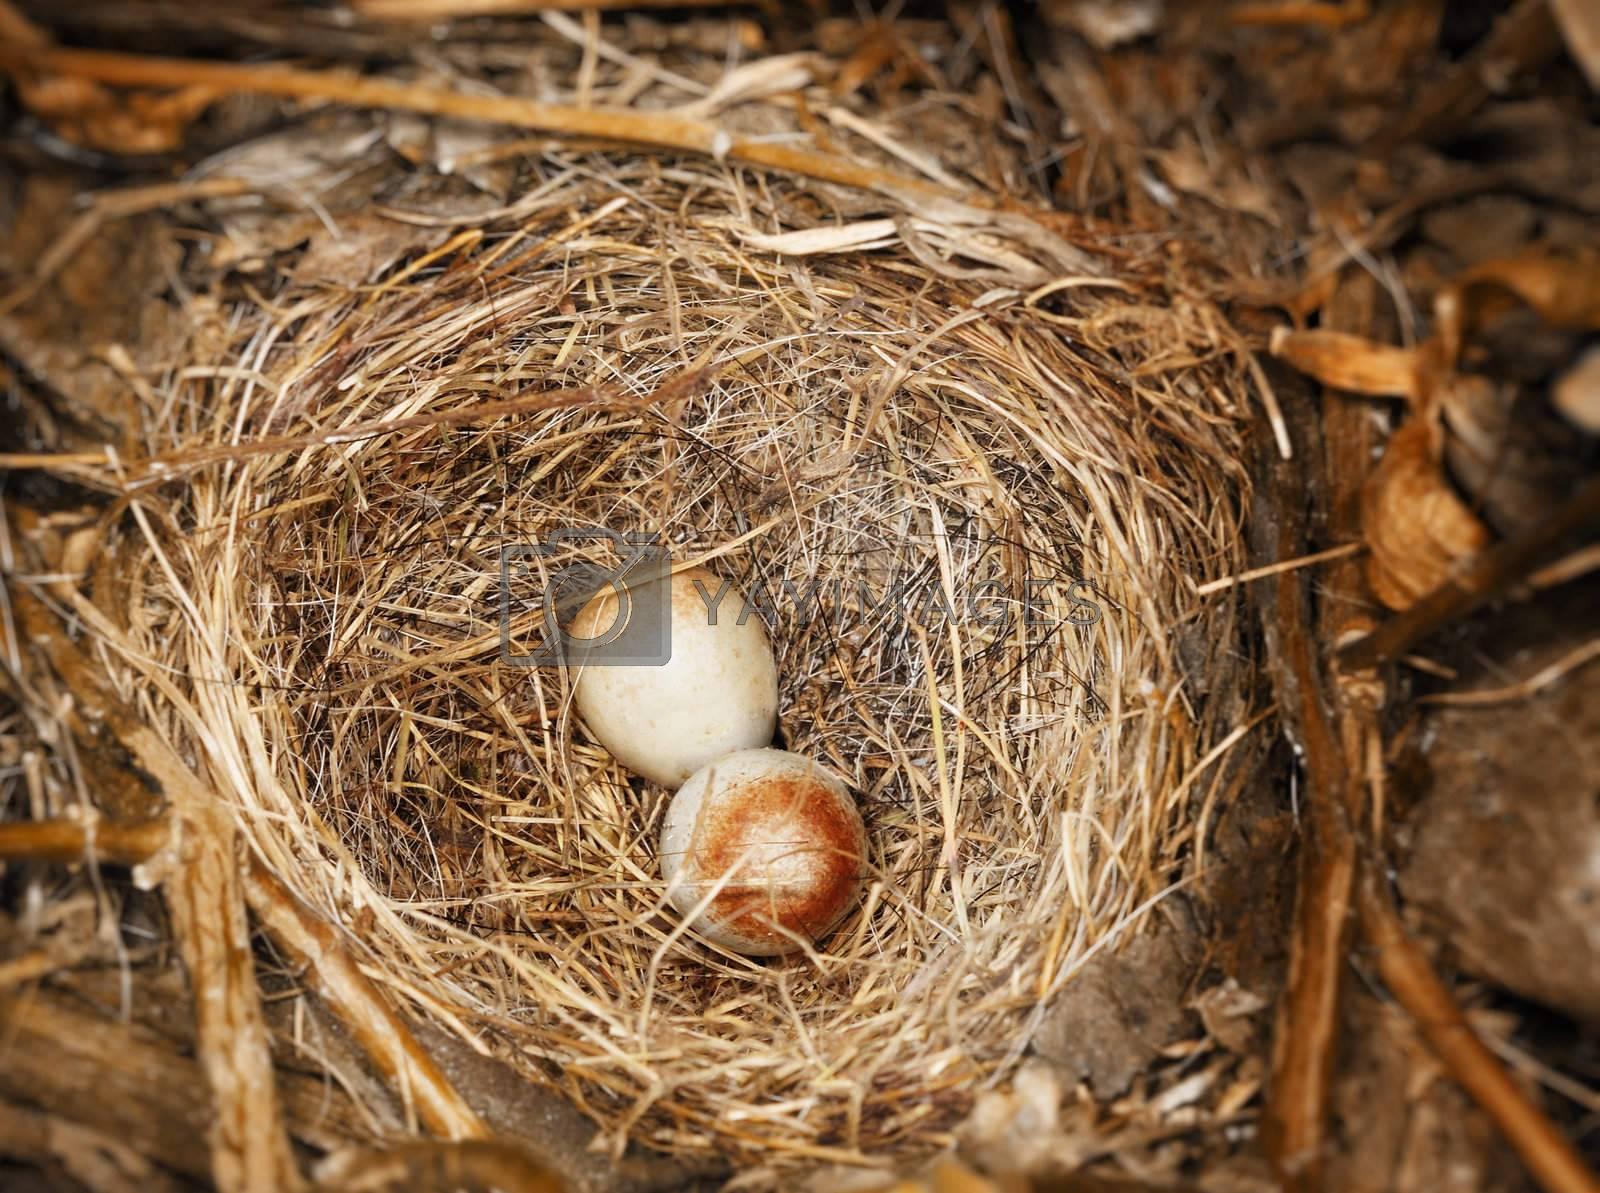 Two eggs of Dark-eyed Junco (Junco hyemalis) in the nest.